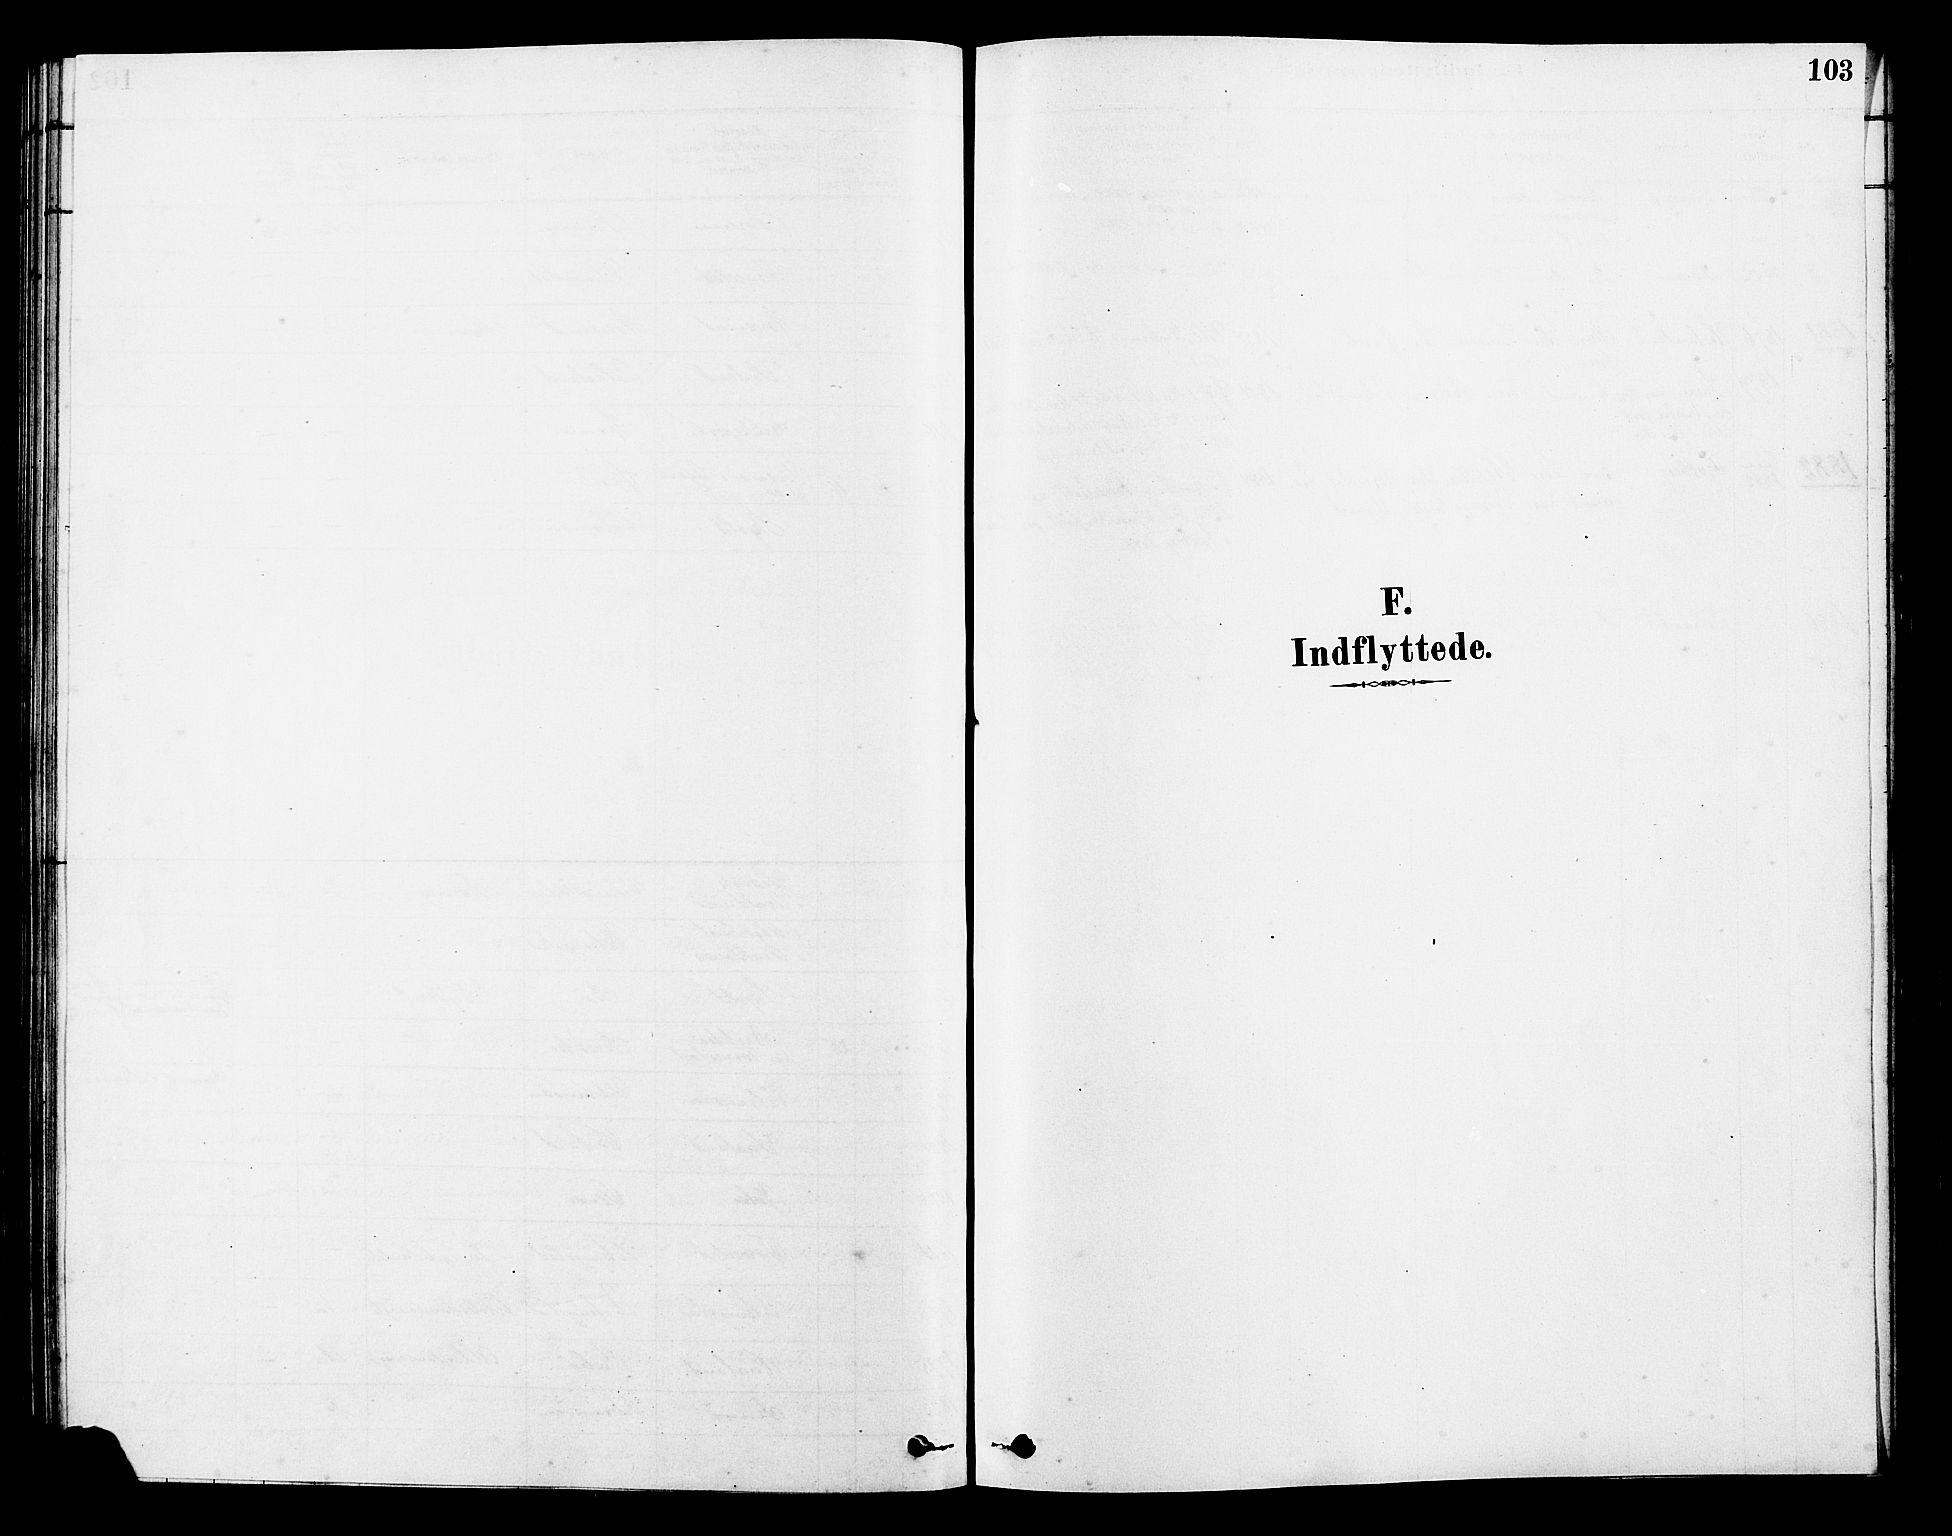 SAST, Torvastad sokneprestkontor, H/Ha/Haa/L0014: Ministerialbok nr. A 13, 1879-1888, s. 103